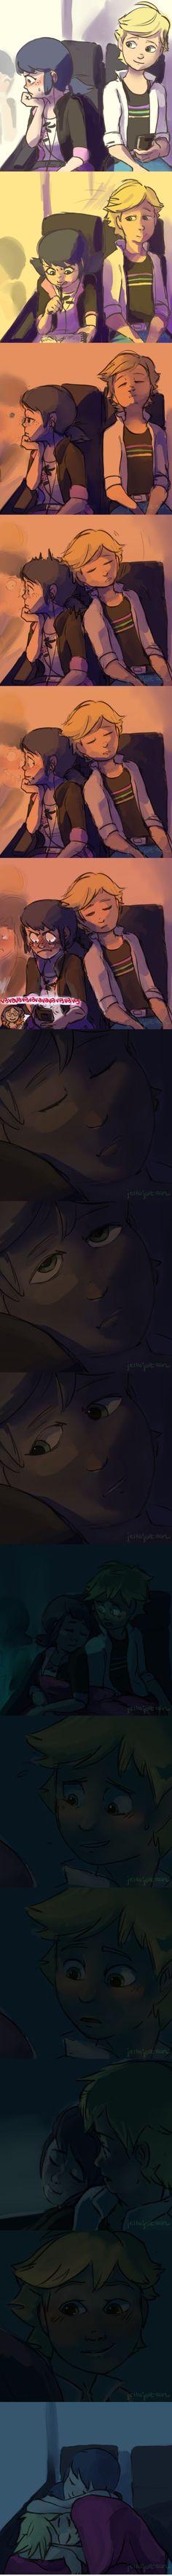 Adrien/Cat Noir ♥ Marinette/Ladybug